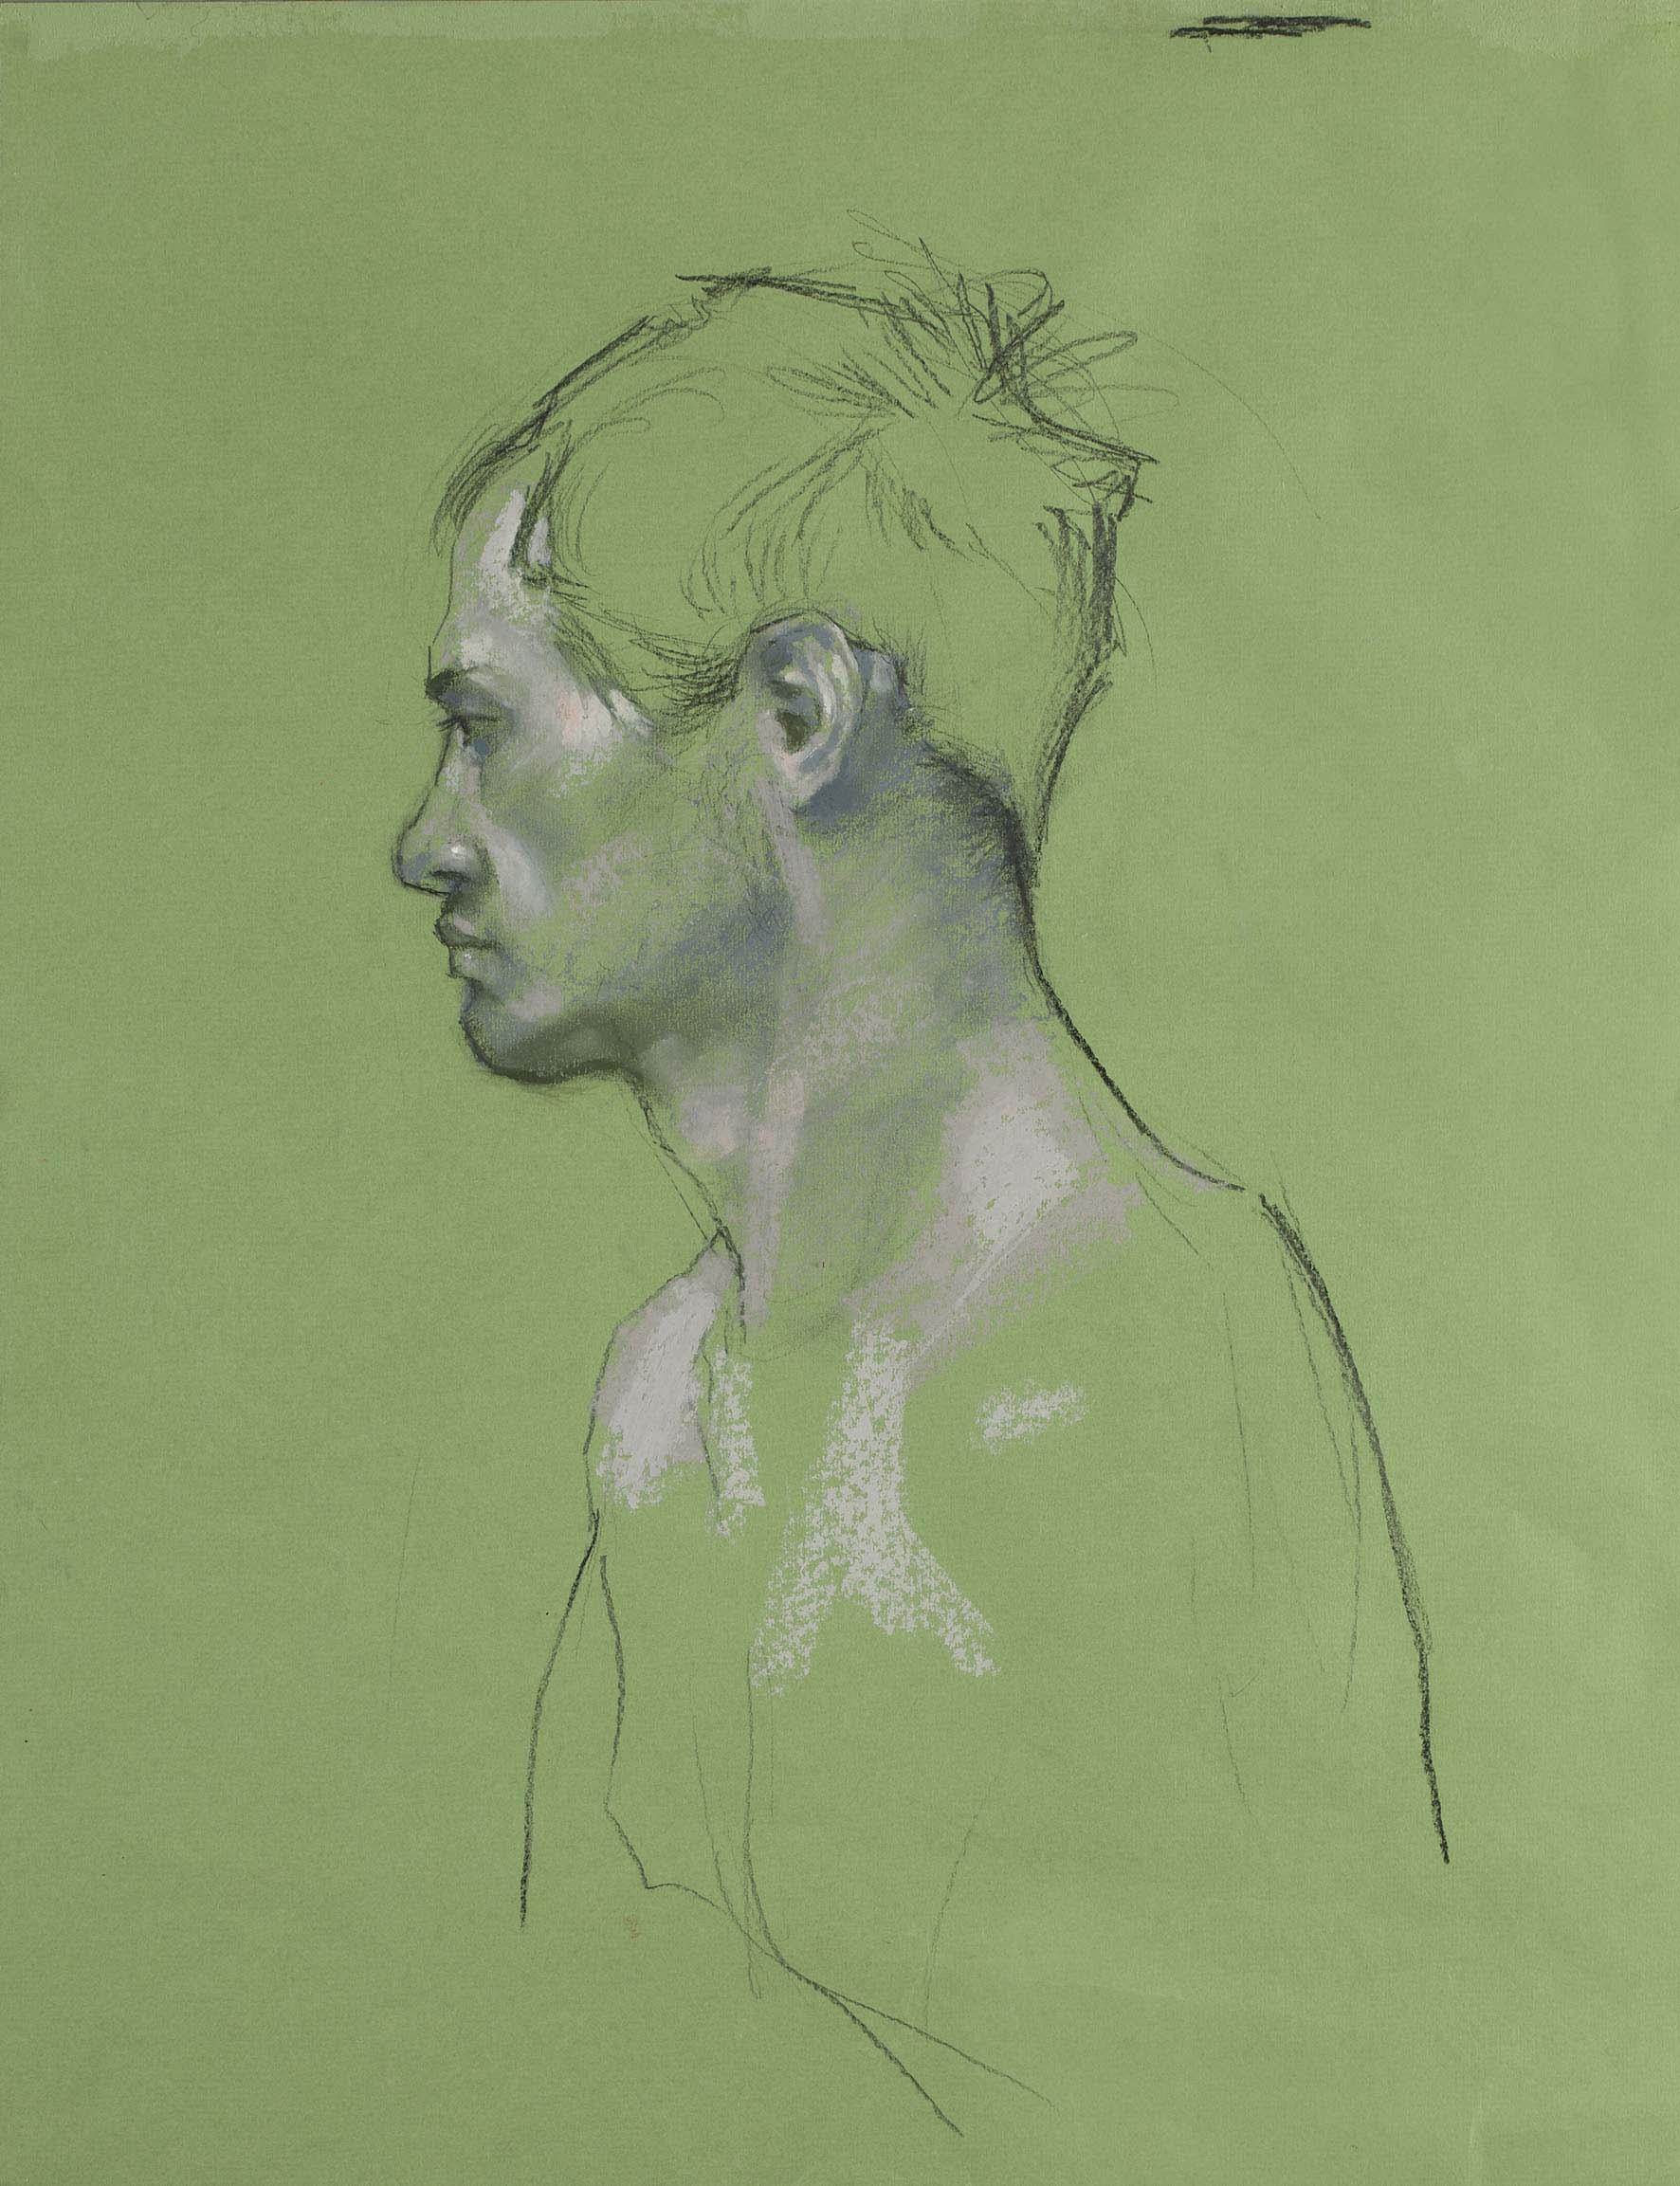 H Craig Hanna Green Man 2010